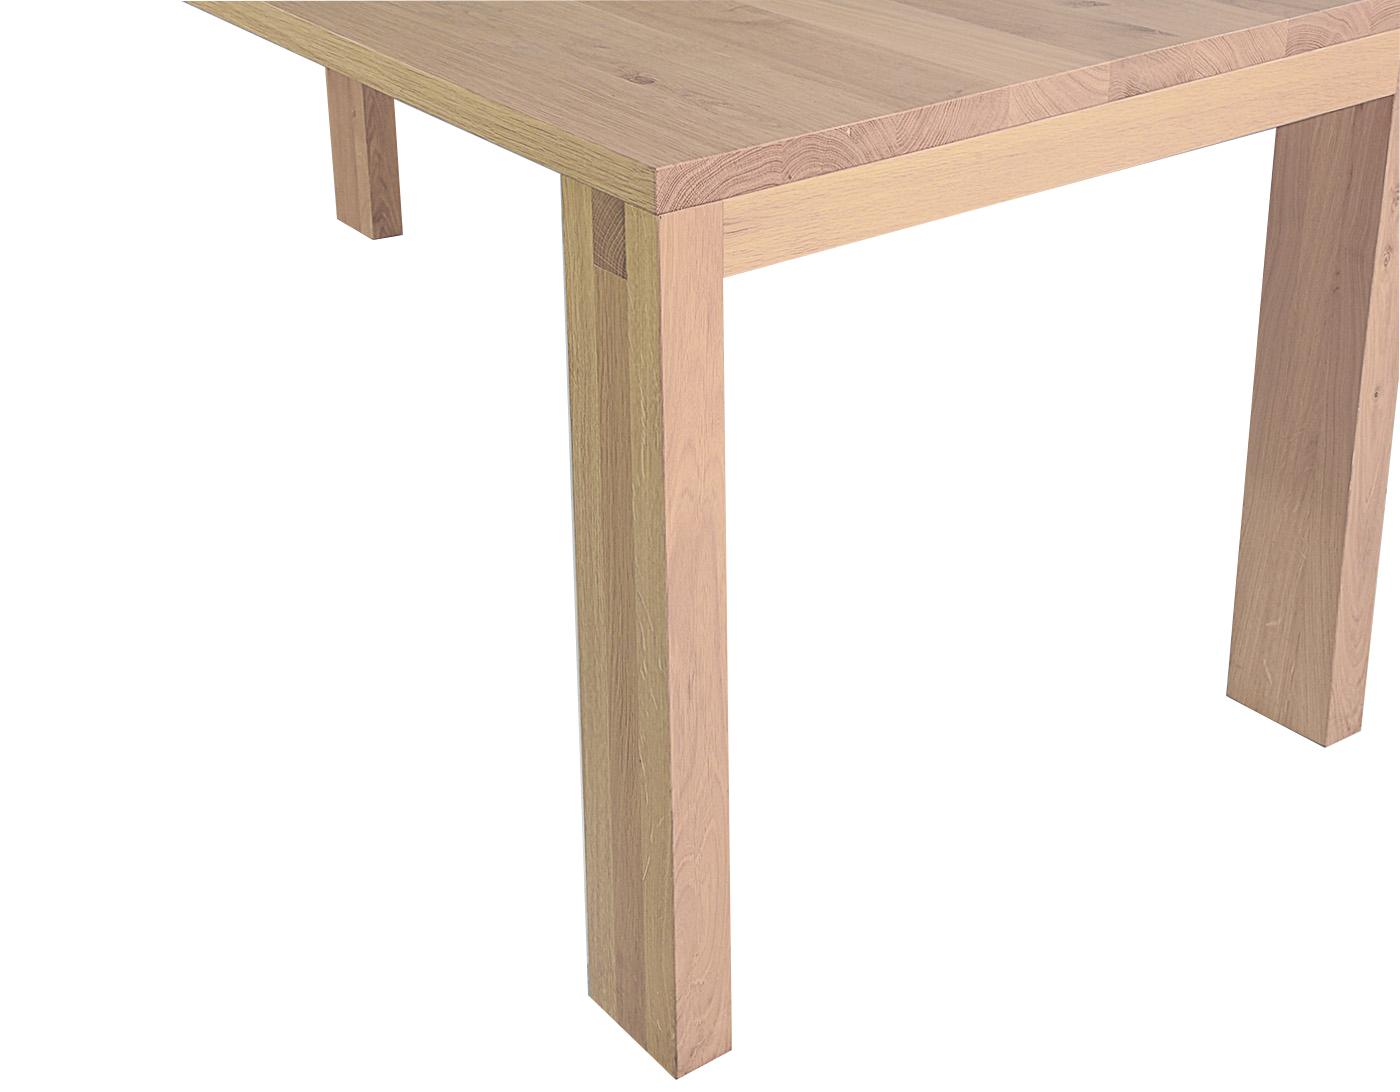 Orleans - Eiken tafels op maat